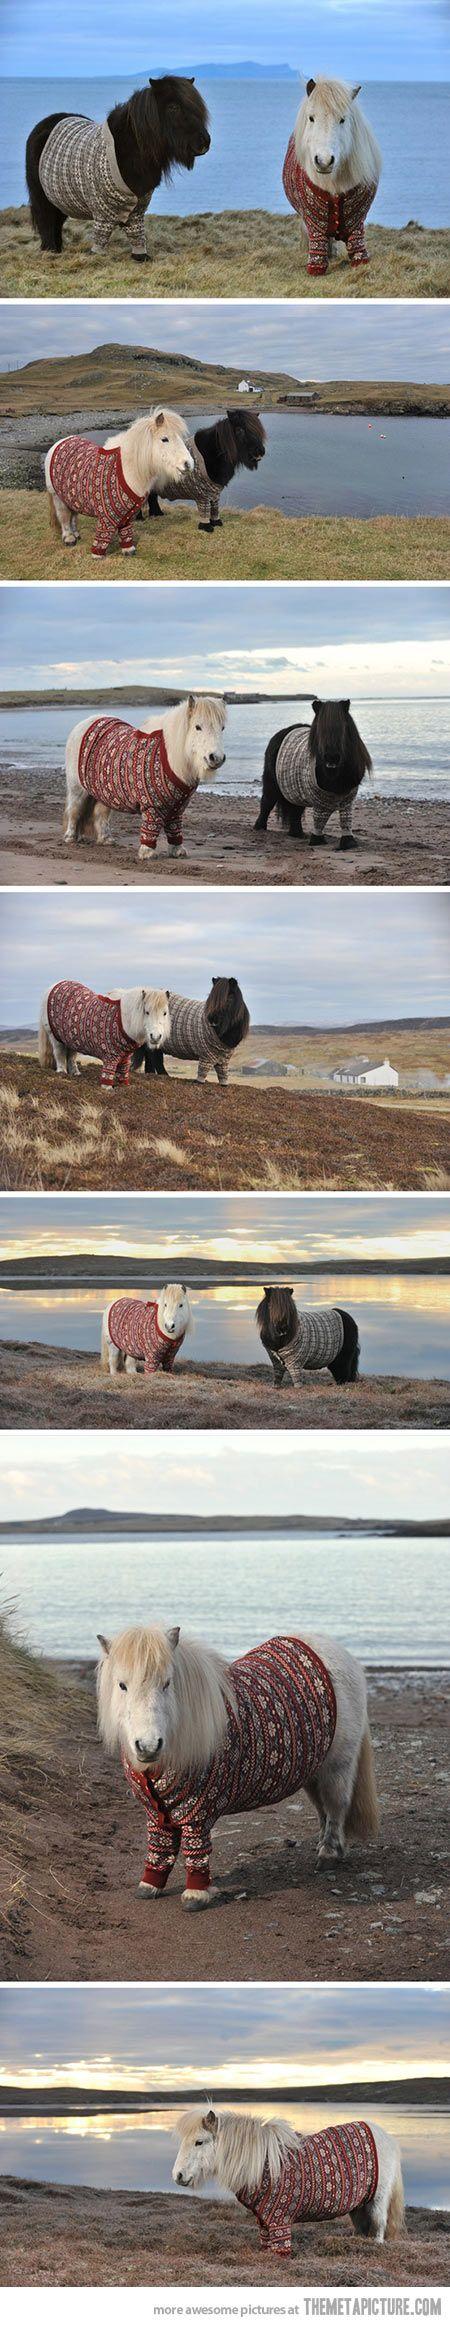 Two Shetland Ponies in Cardigan Sweaters (Scotland http://www.adweek.com/adfreak/two-shetland-ponies-cardigan-sweaters-are-scotlands-new-ad-stars-146755 )